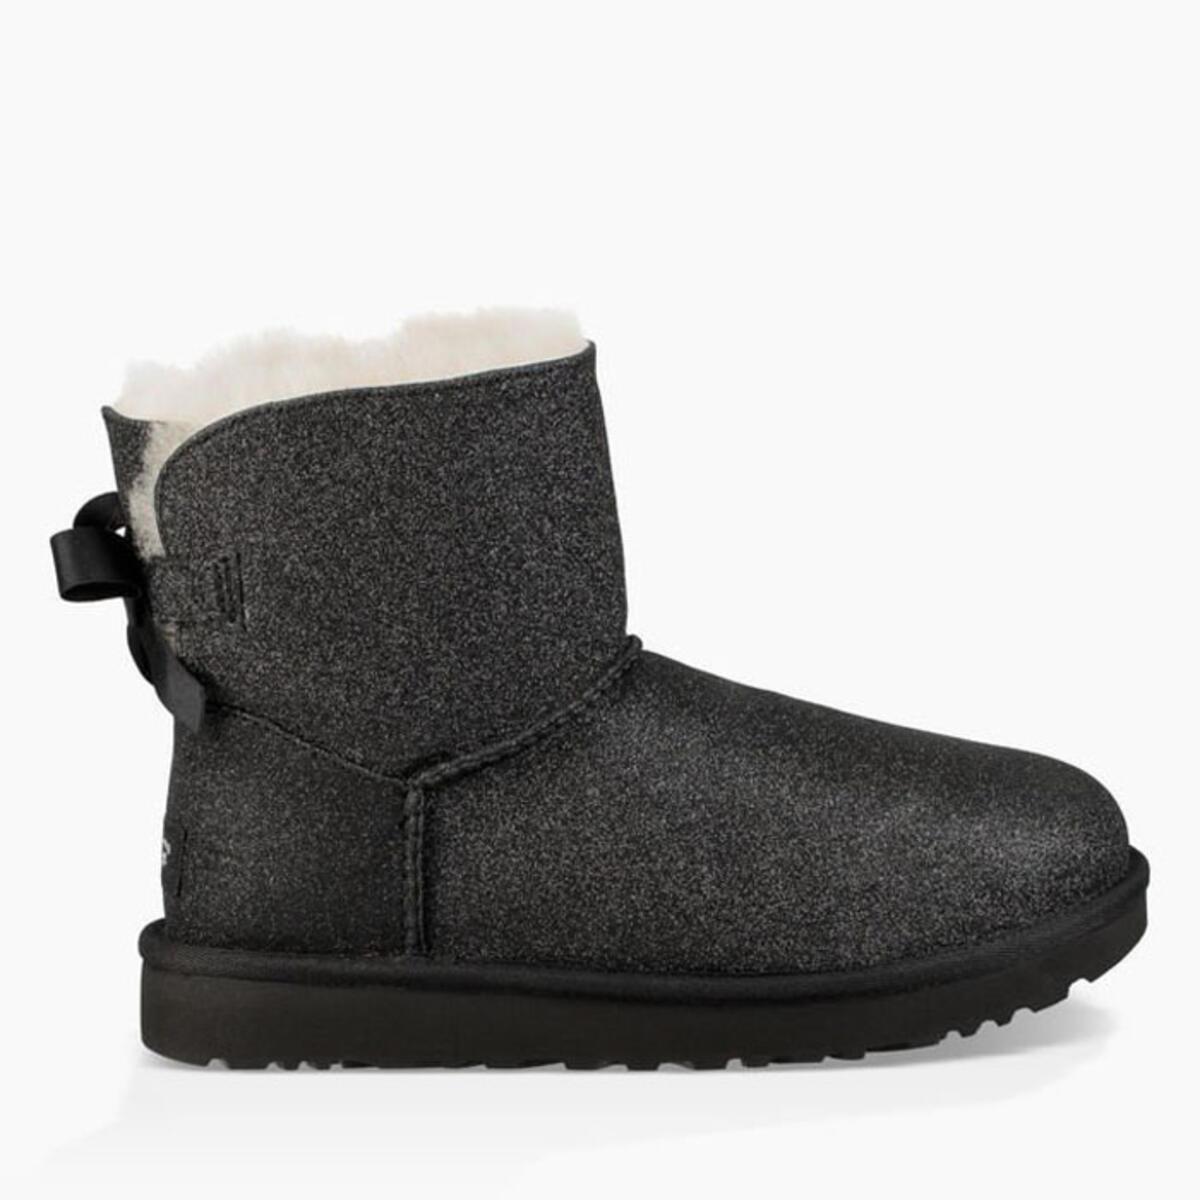 e3092a318c9 Ugg Women's Mini Bailey Bow Sparkle Winter Boots